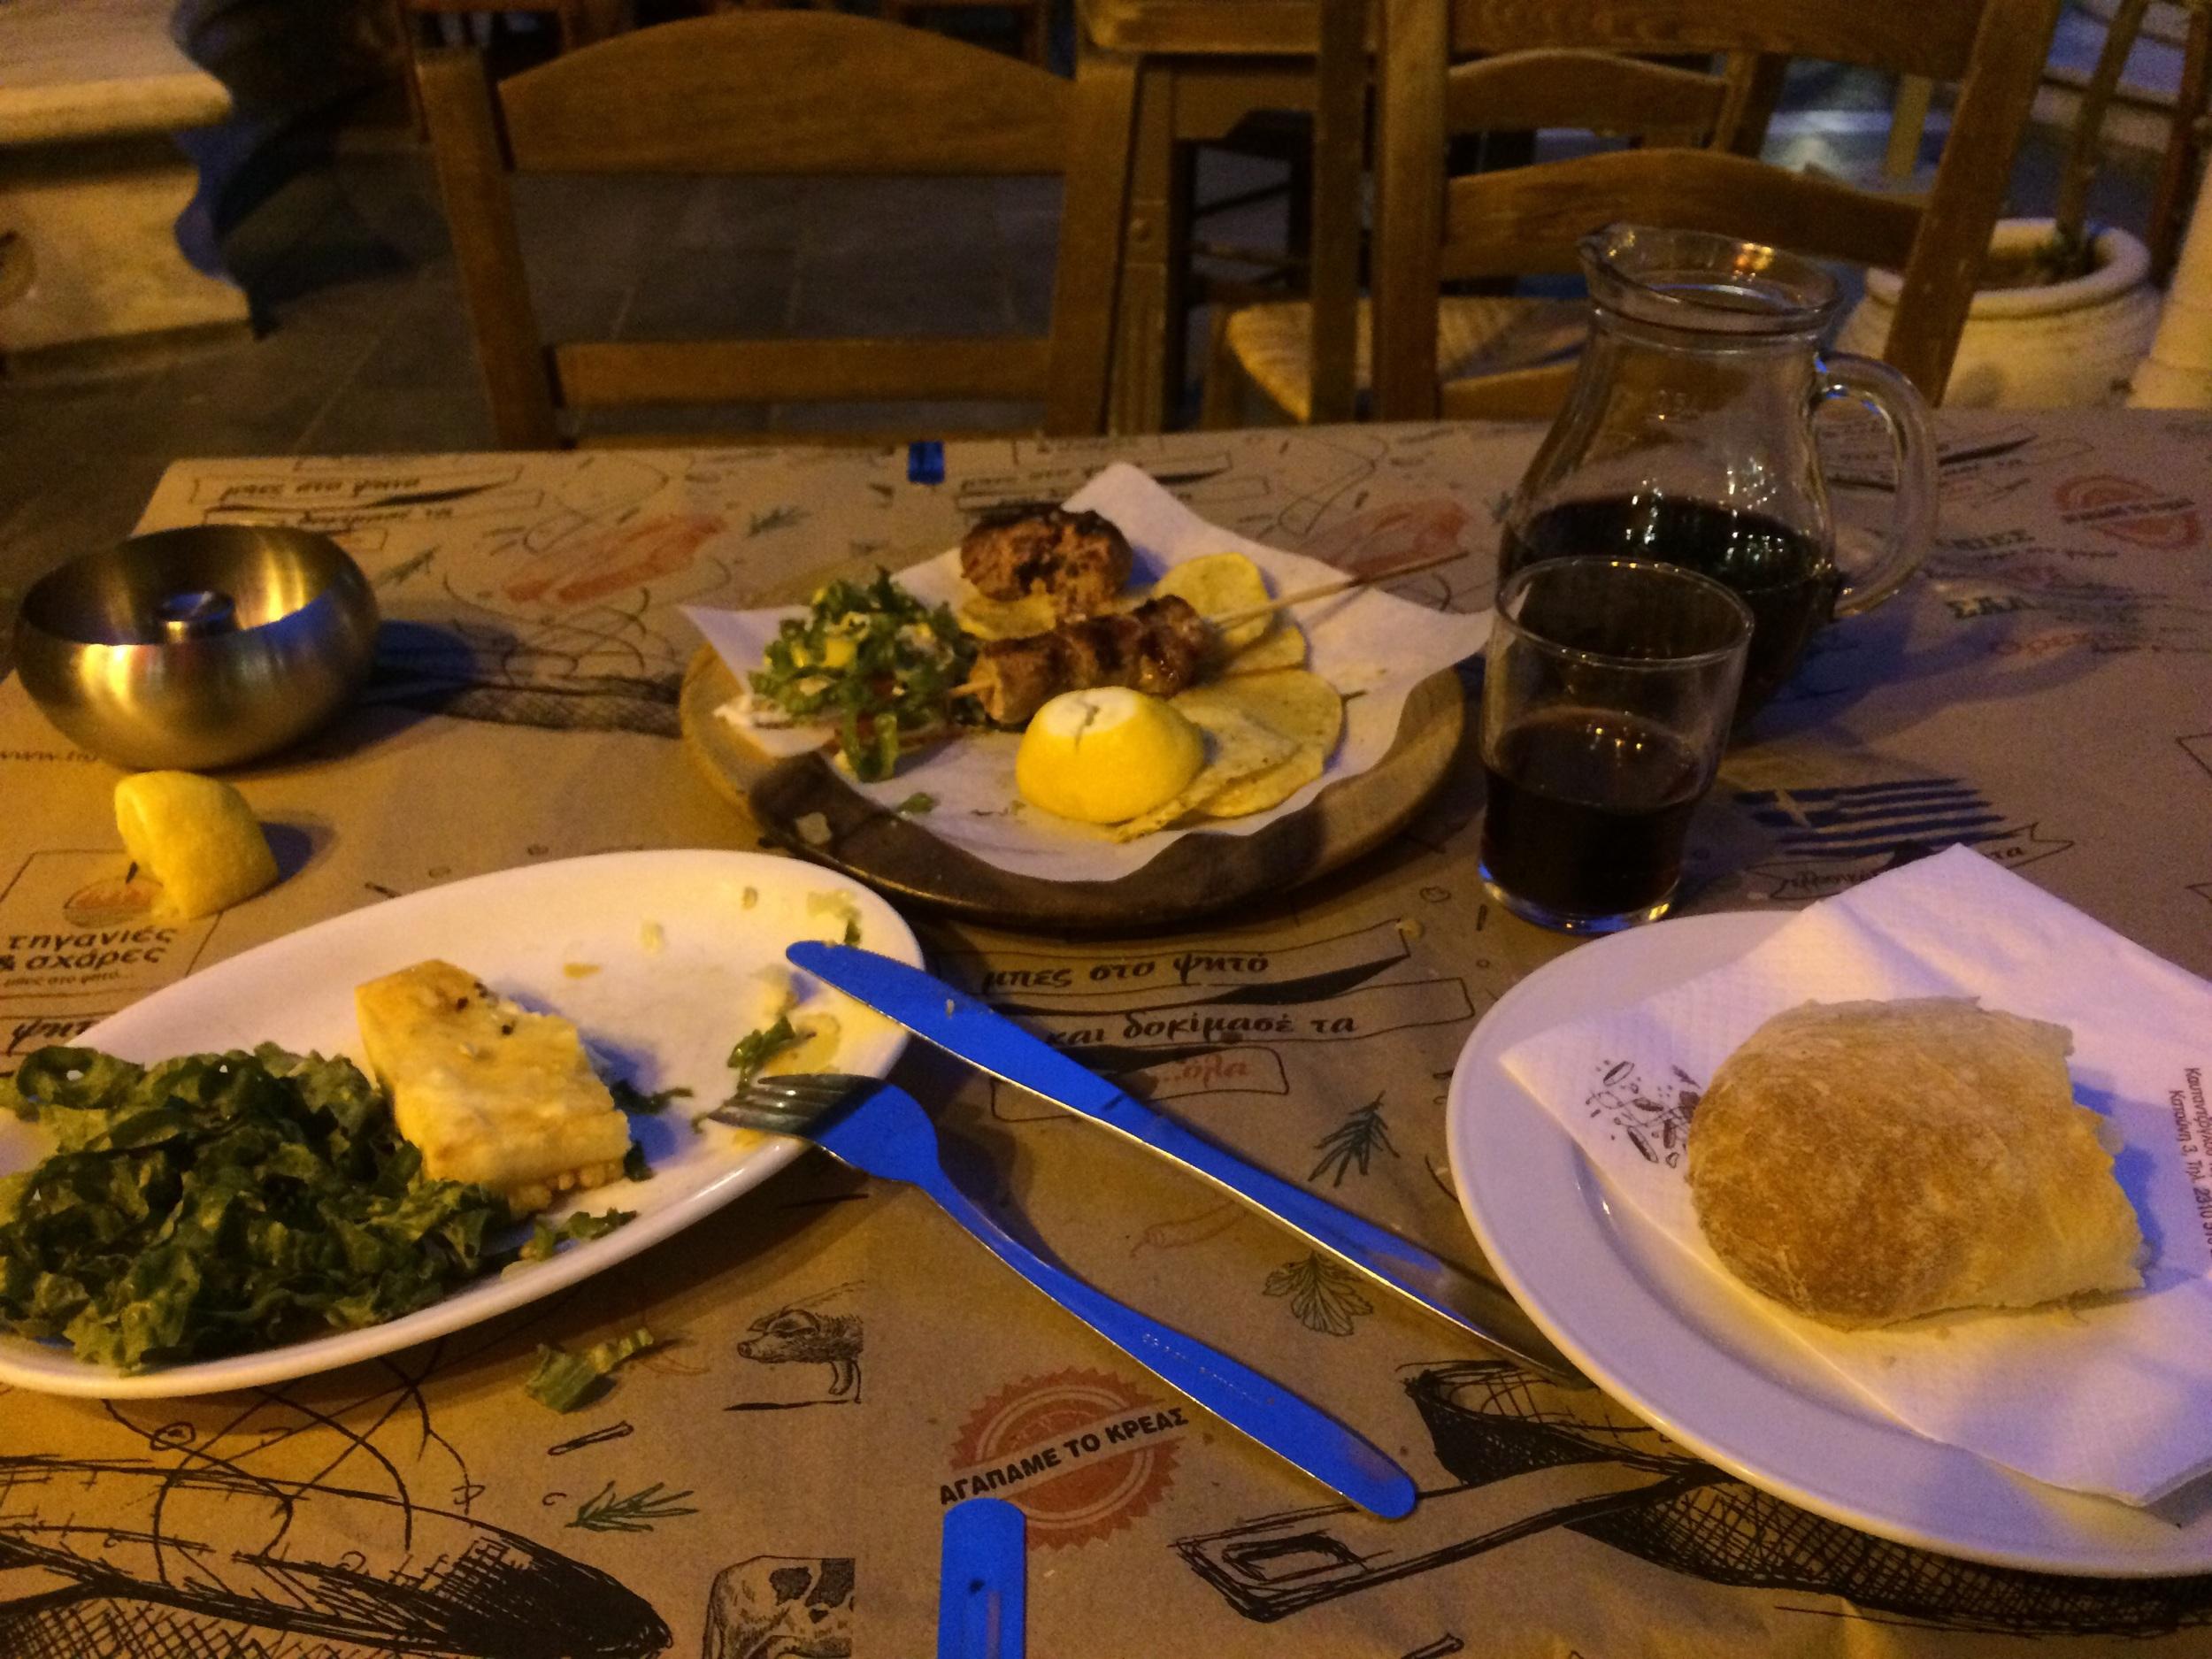 Meatball, souvlaki, saganaki, demi-sweet wine, bread